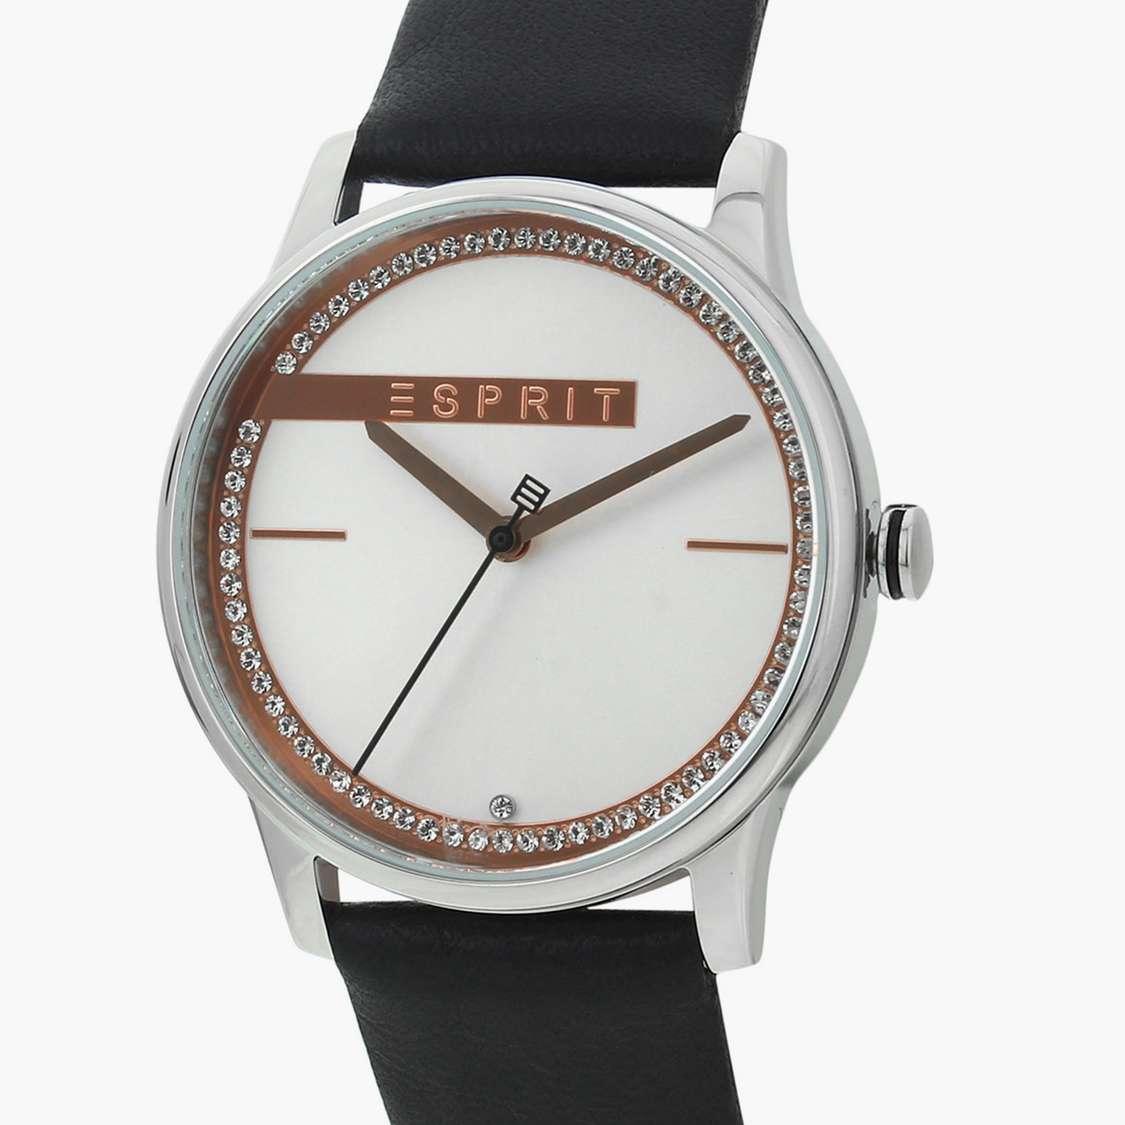 ESPRIT Women Analog Watch with Leather Strap - ES1L082L0015